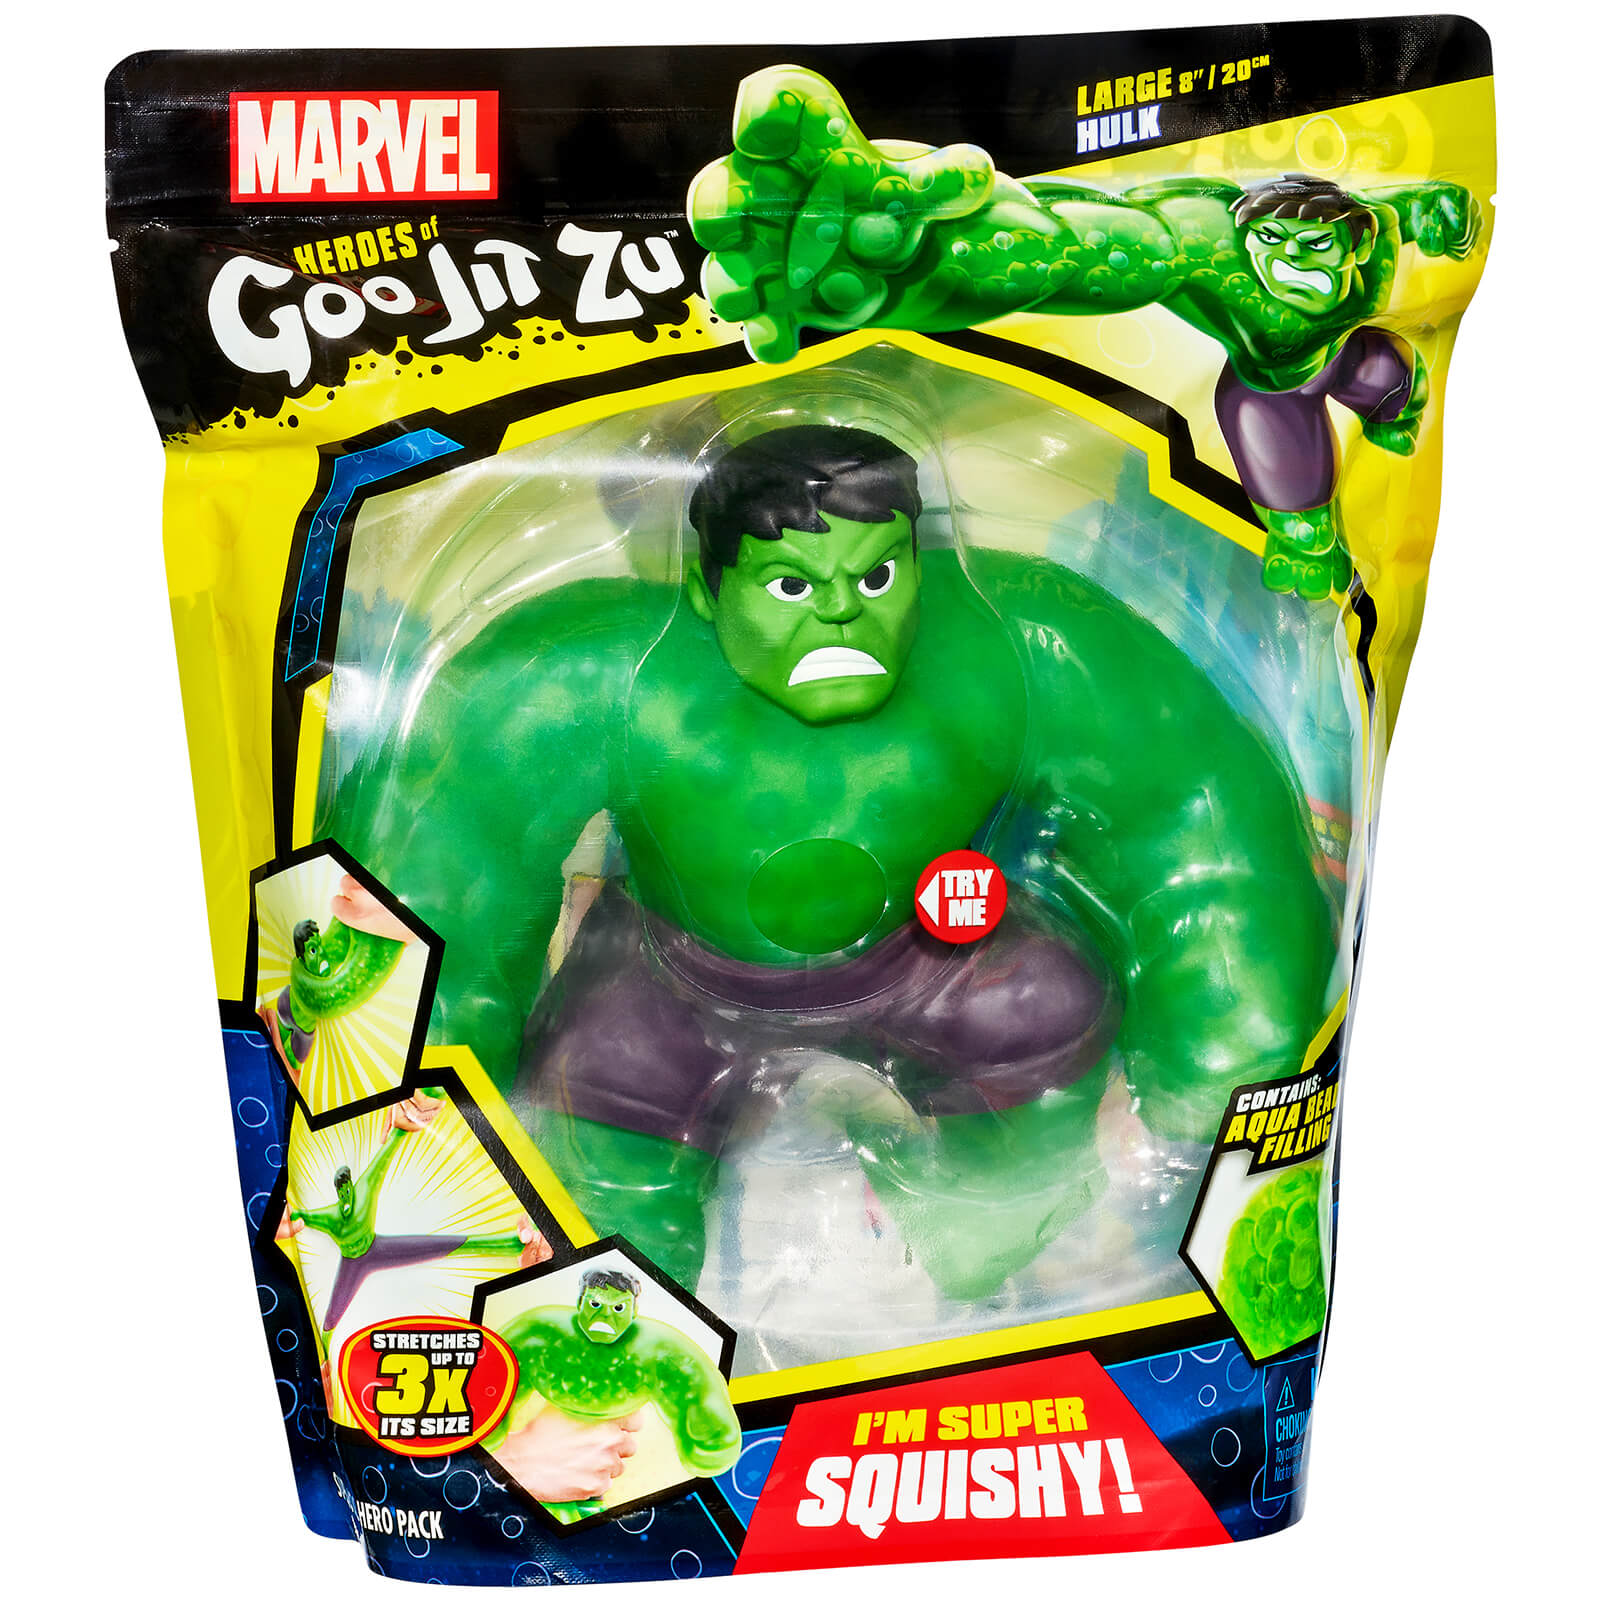 Image of Heroes of Goo Jit Zu Marvel - Supagoo Hulk